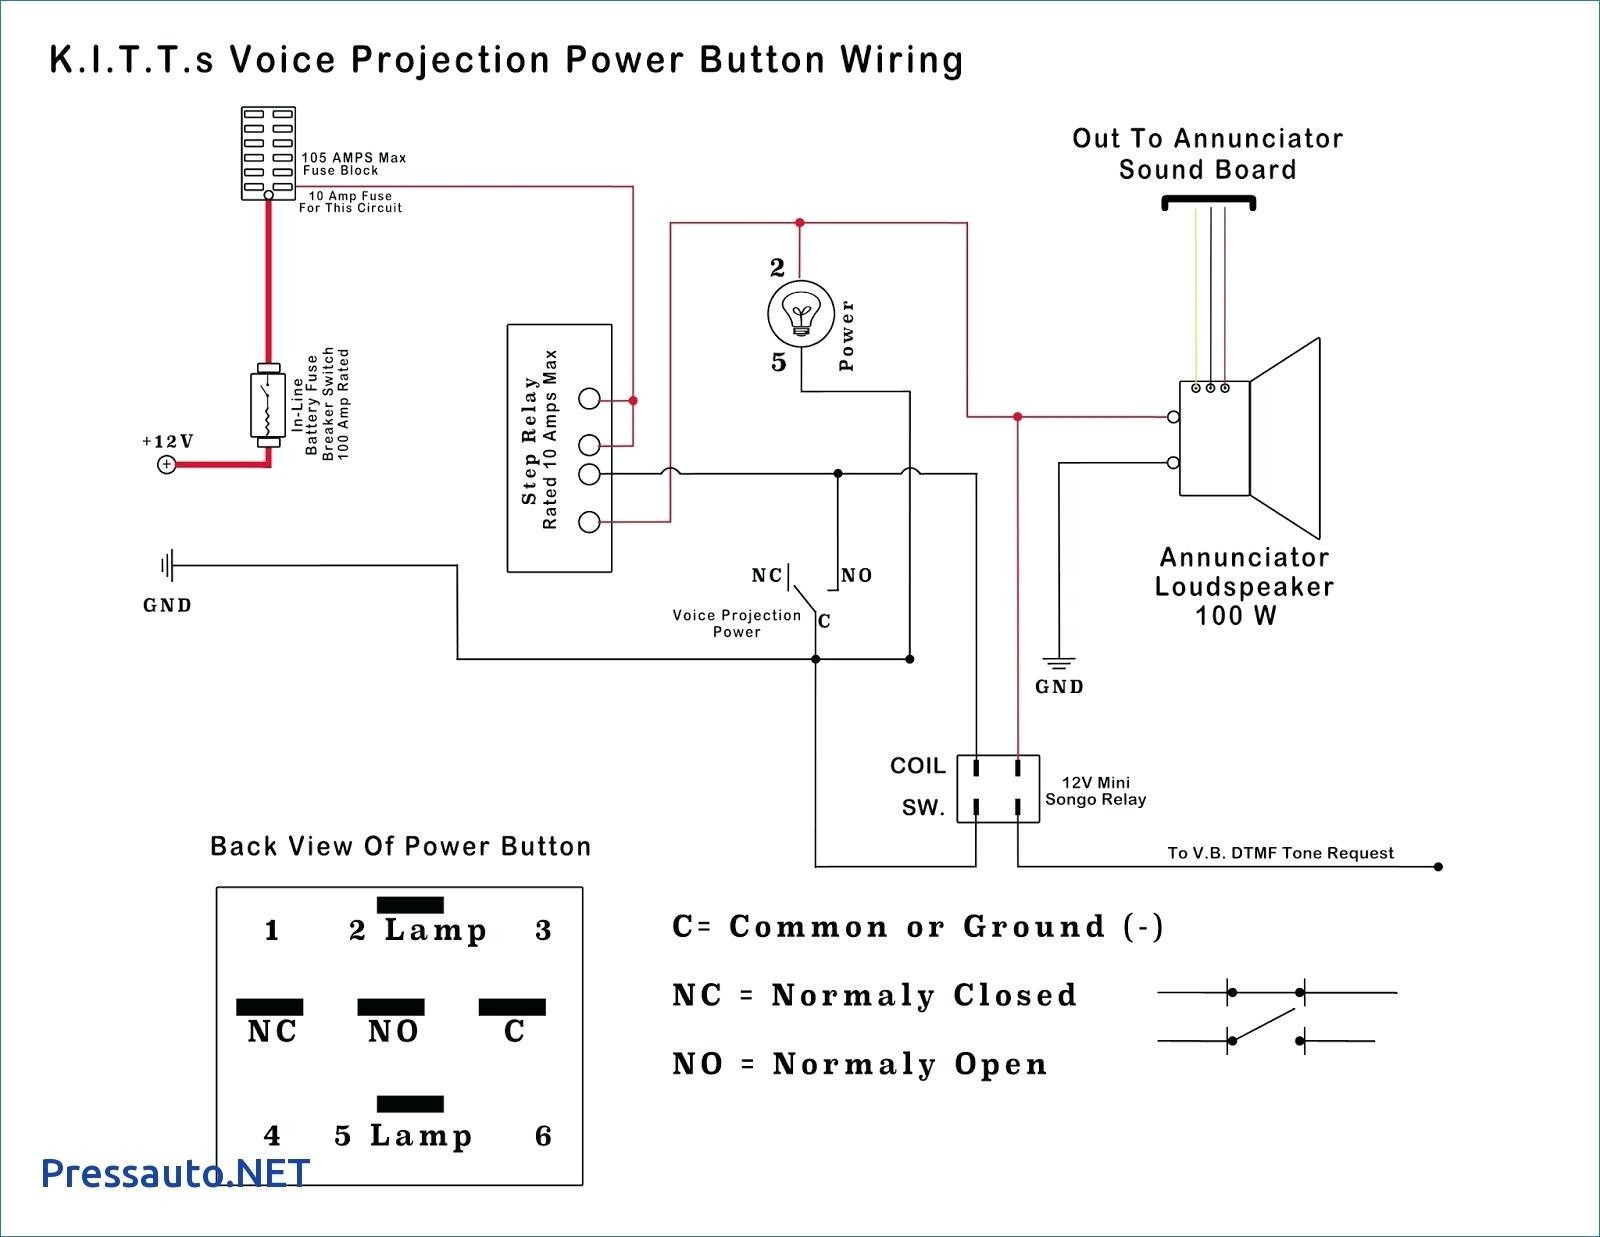 Ford 7 3 Engine Diagram 7 3 Powerstroke Glow Plug Relay Wiring Diagram Inspirational Wiring Of Ford 7 3 Engine Diagram